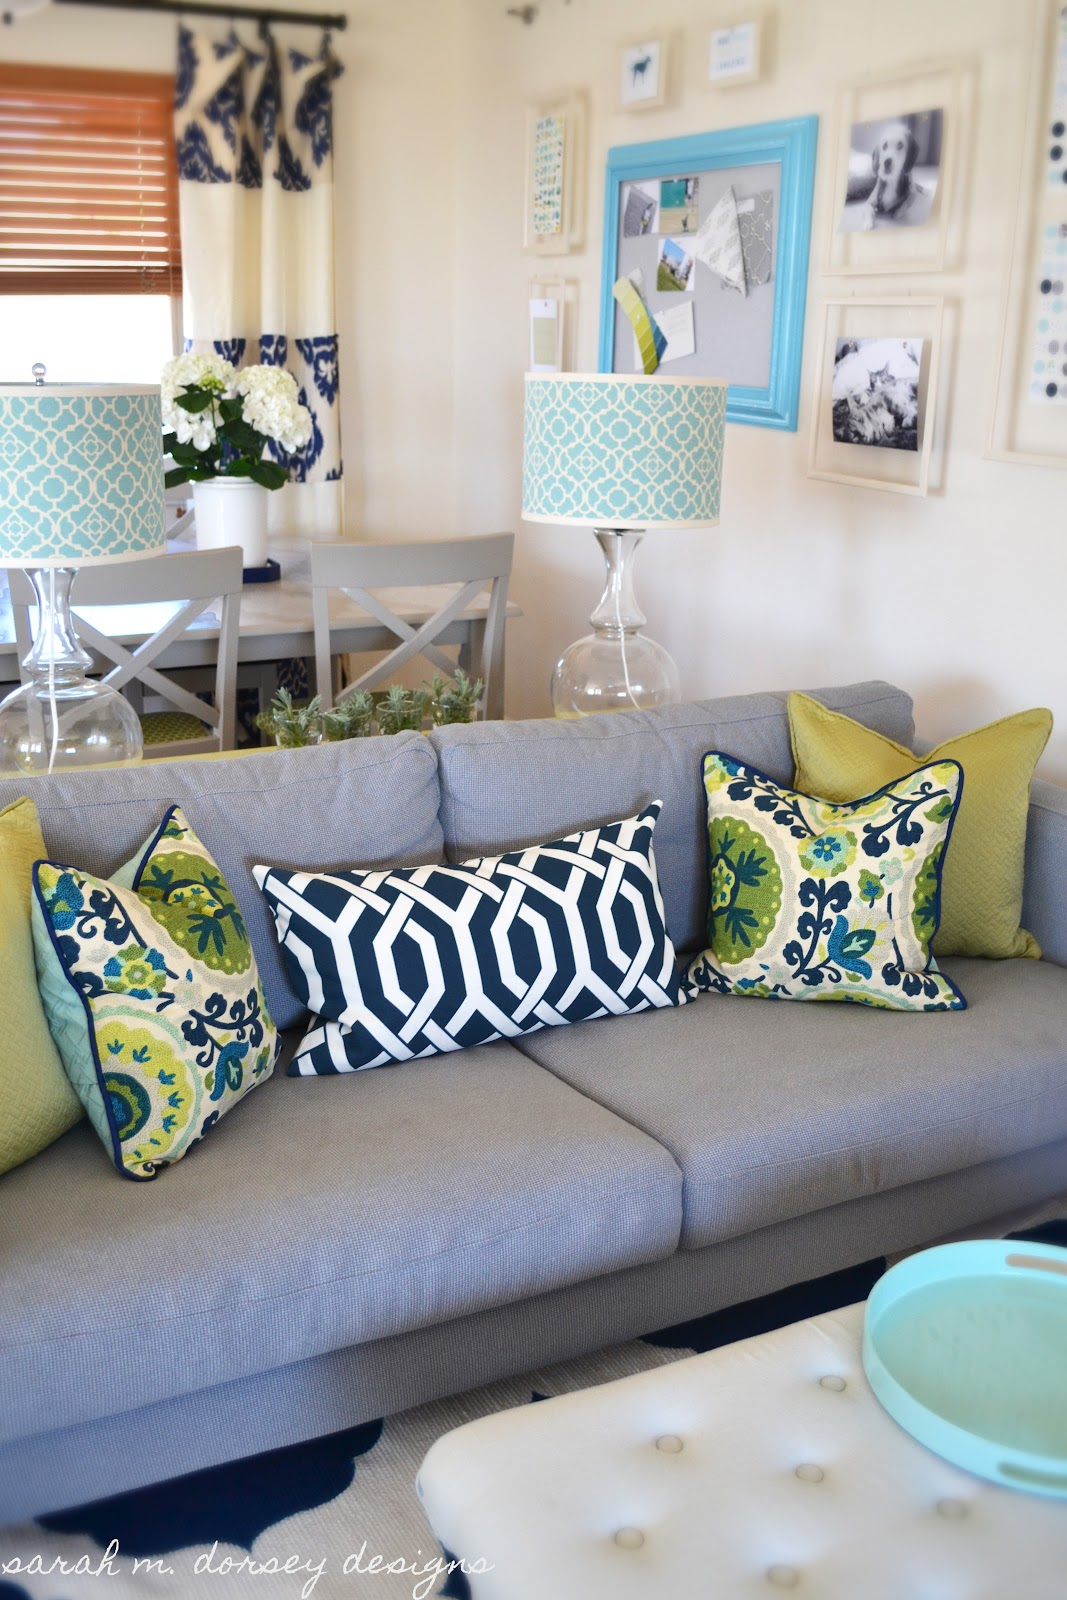 sarah m. dorsey designs: Pillow Shams for the Living Room